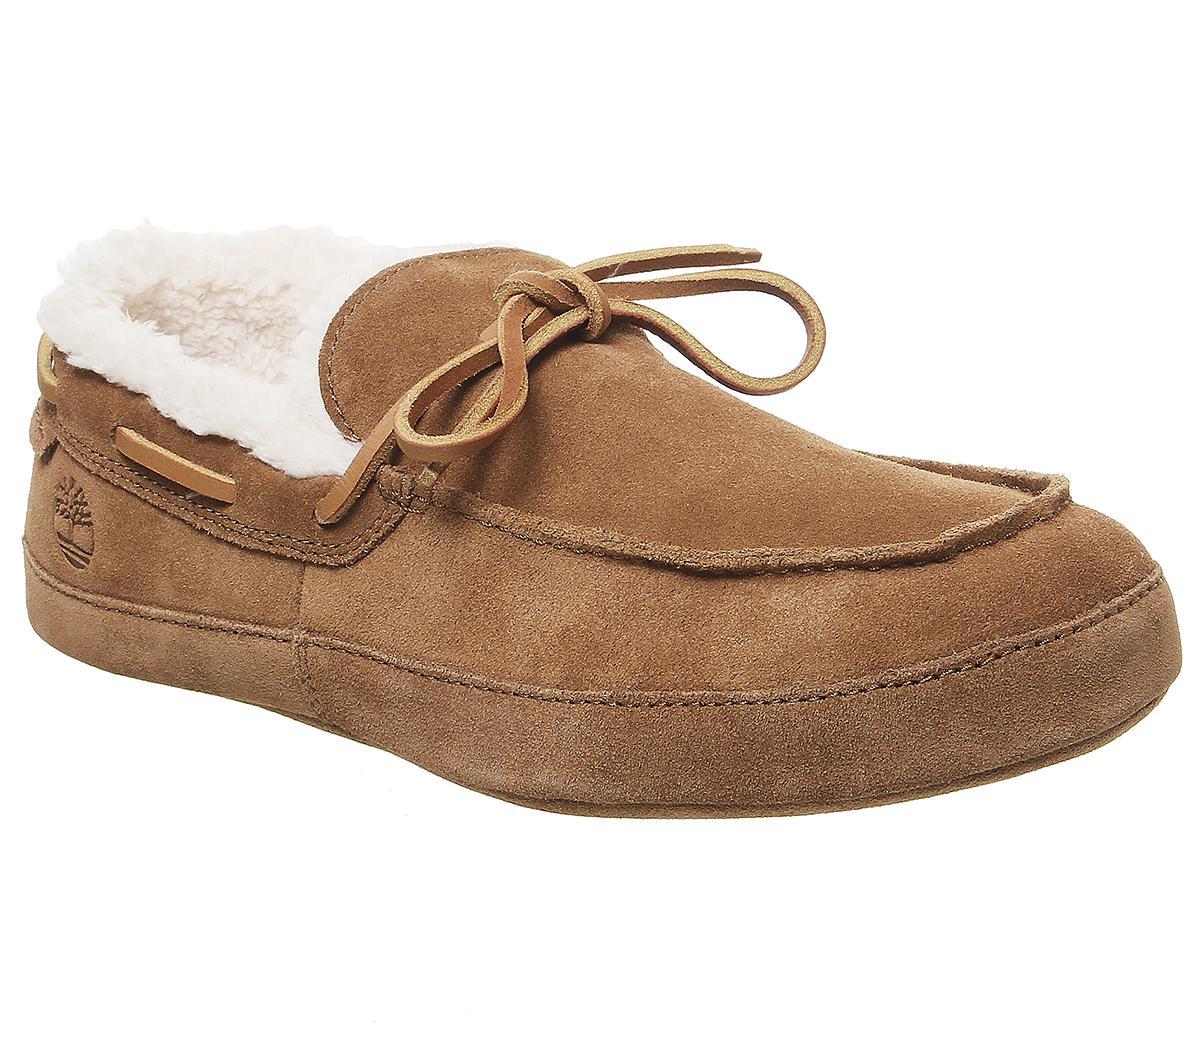 Torrez Slippers